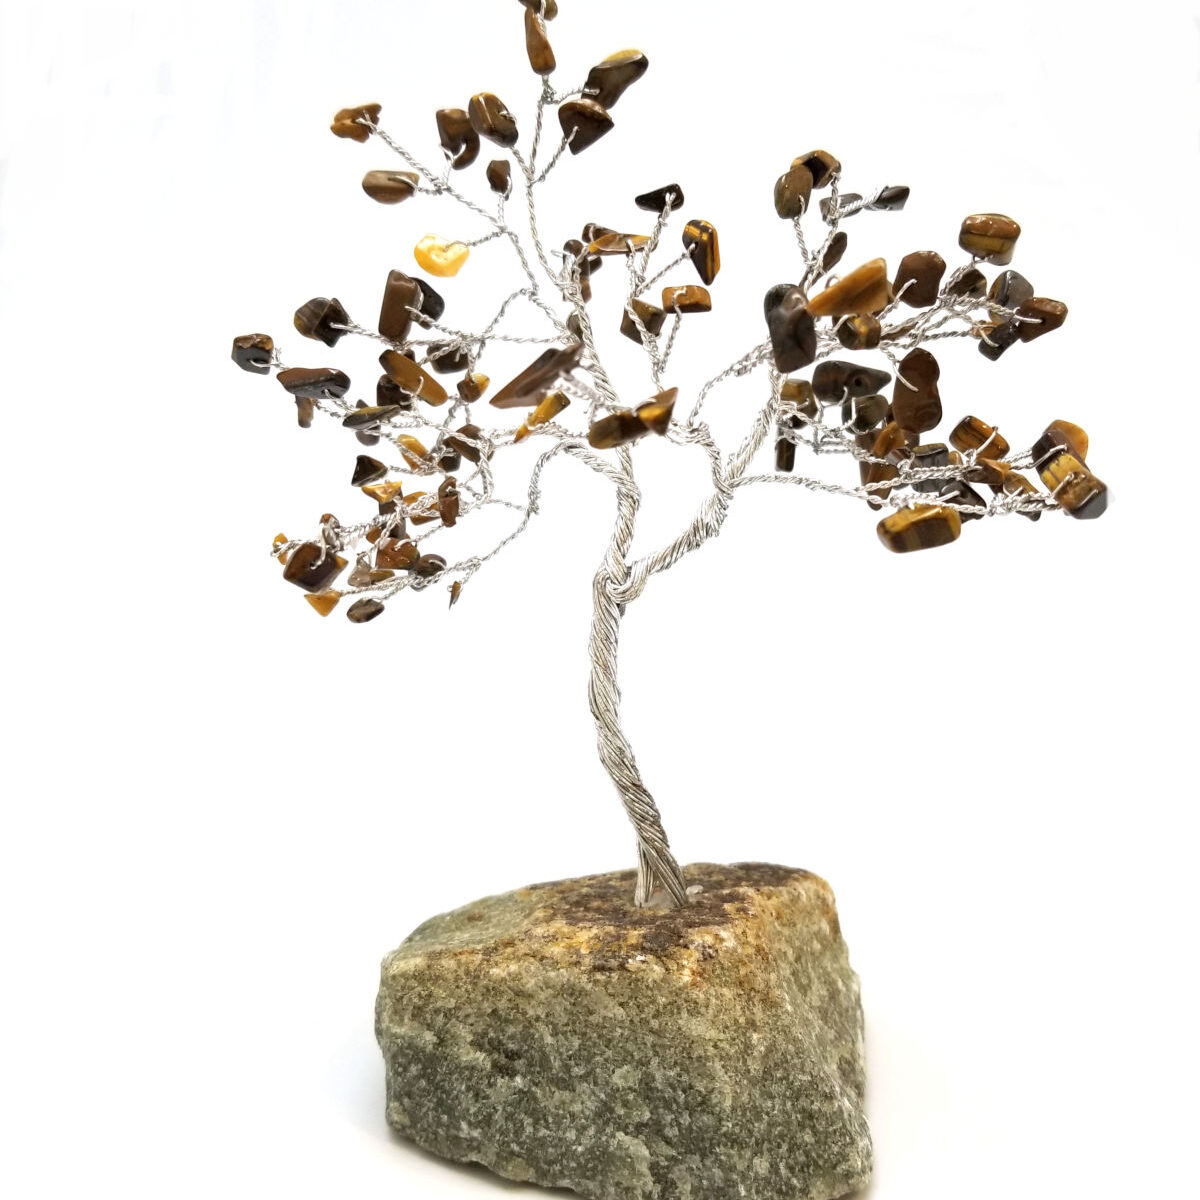 gemstone tree sculpture with brown tiger's eye leaves